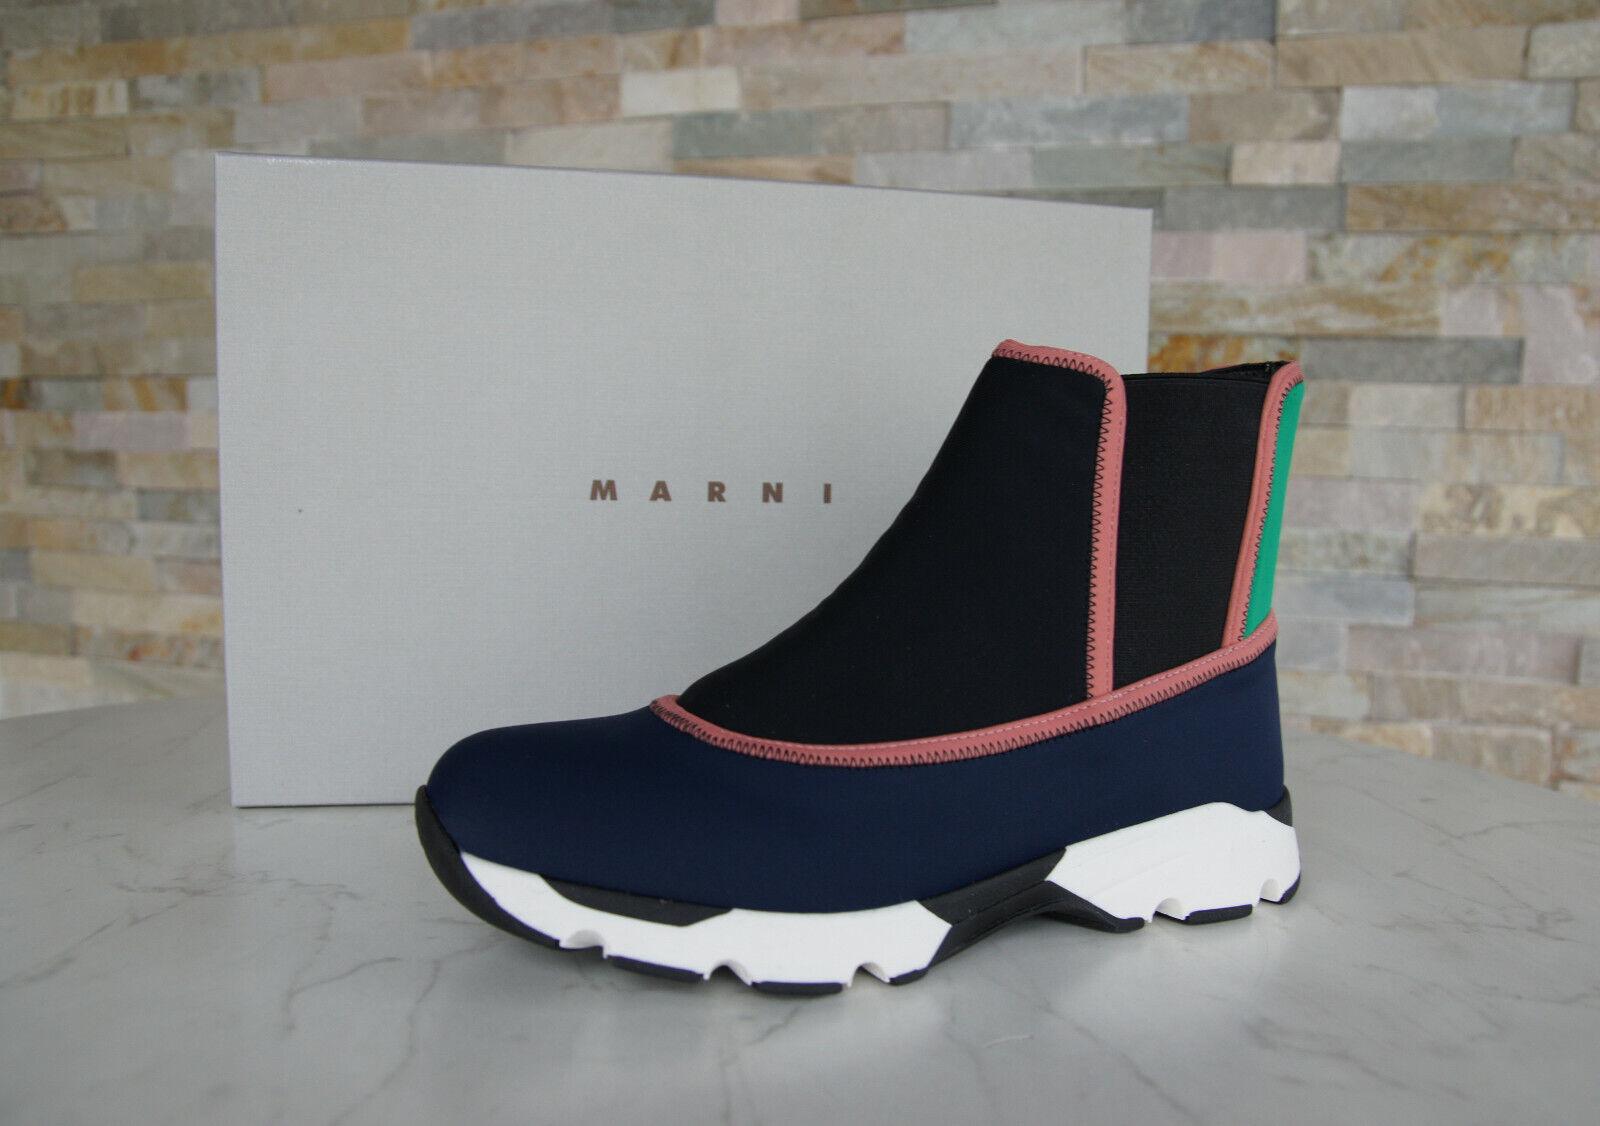 Marni Taille 38 High-Top Slip-On Baskets Chaussures Bariolé Bleu Neuf Autrefois